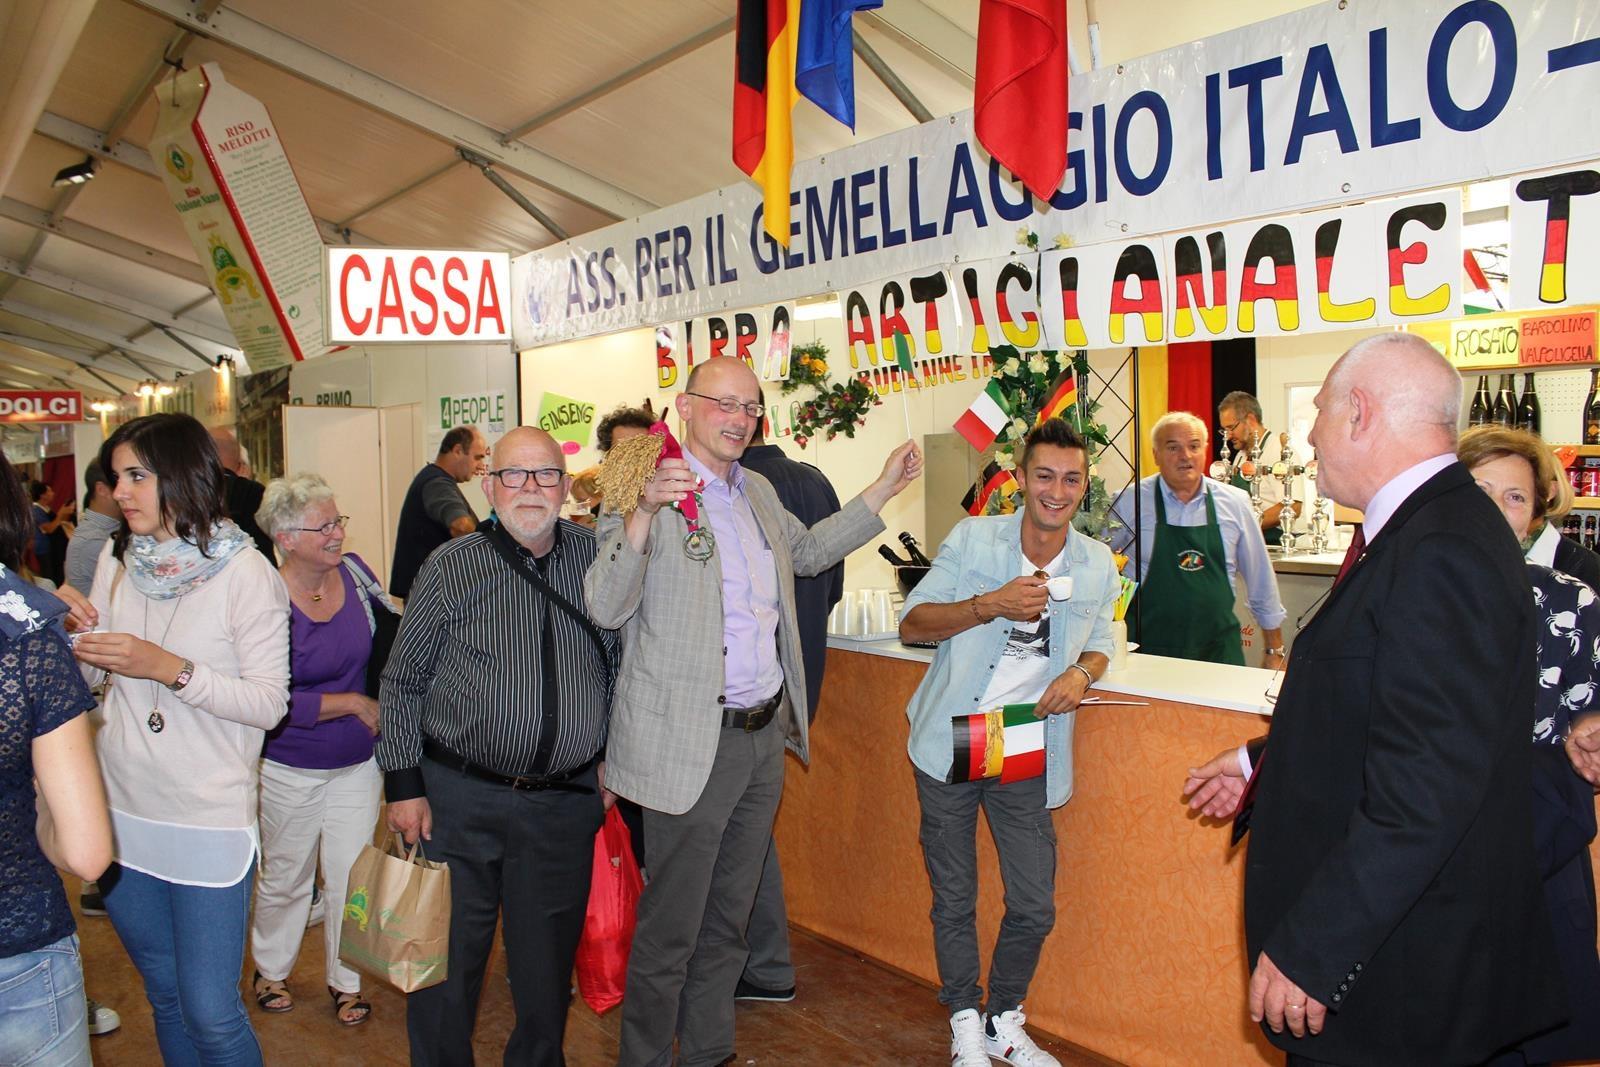 Reisfest in Isola della Scala 2015 (19)